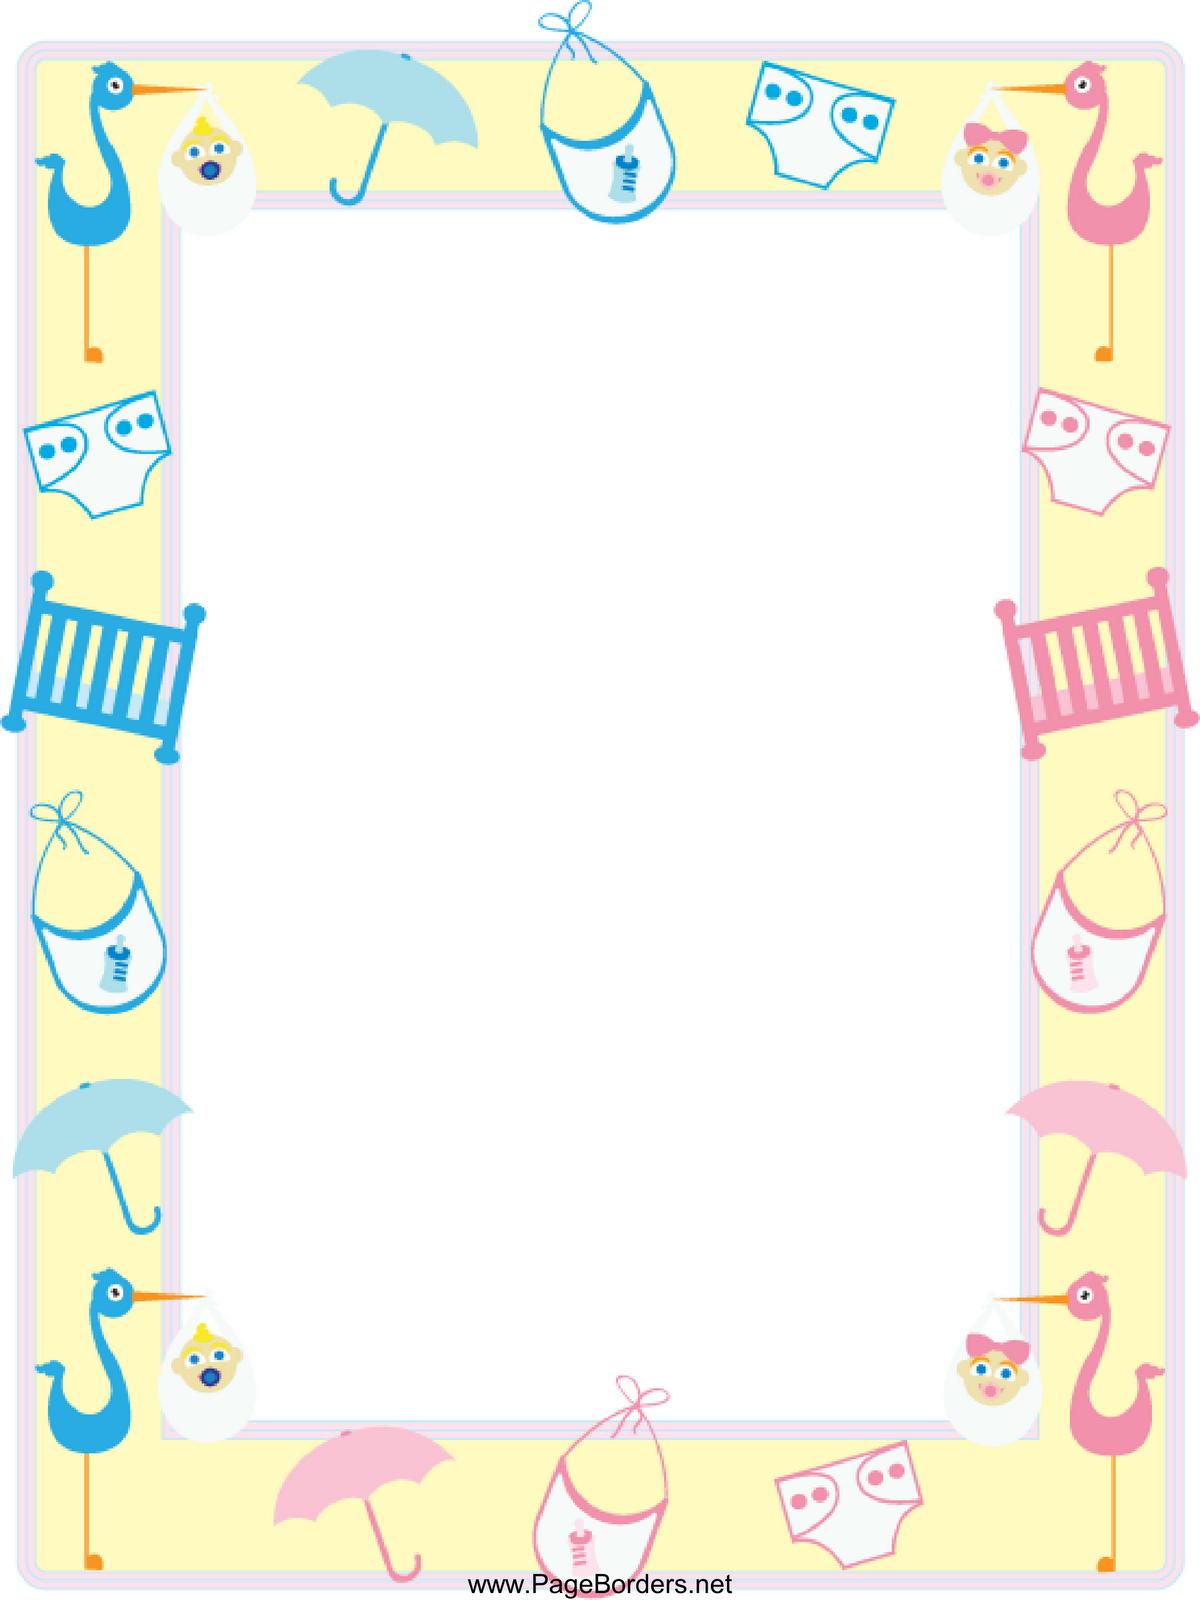 Free Baby Border Free, Download Free Clip Art, Free Clip Art On - Free Printable Baby Borders For Paper